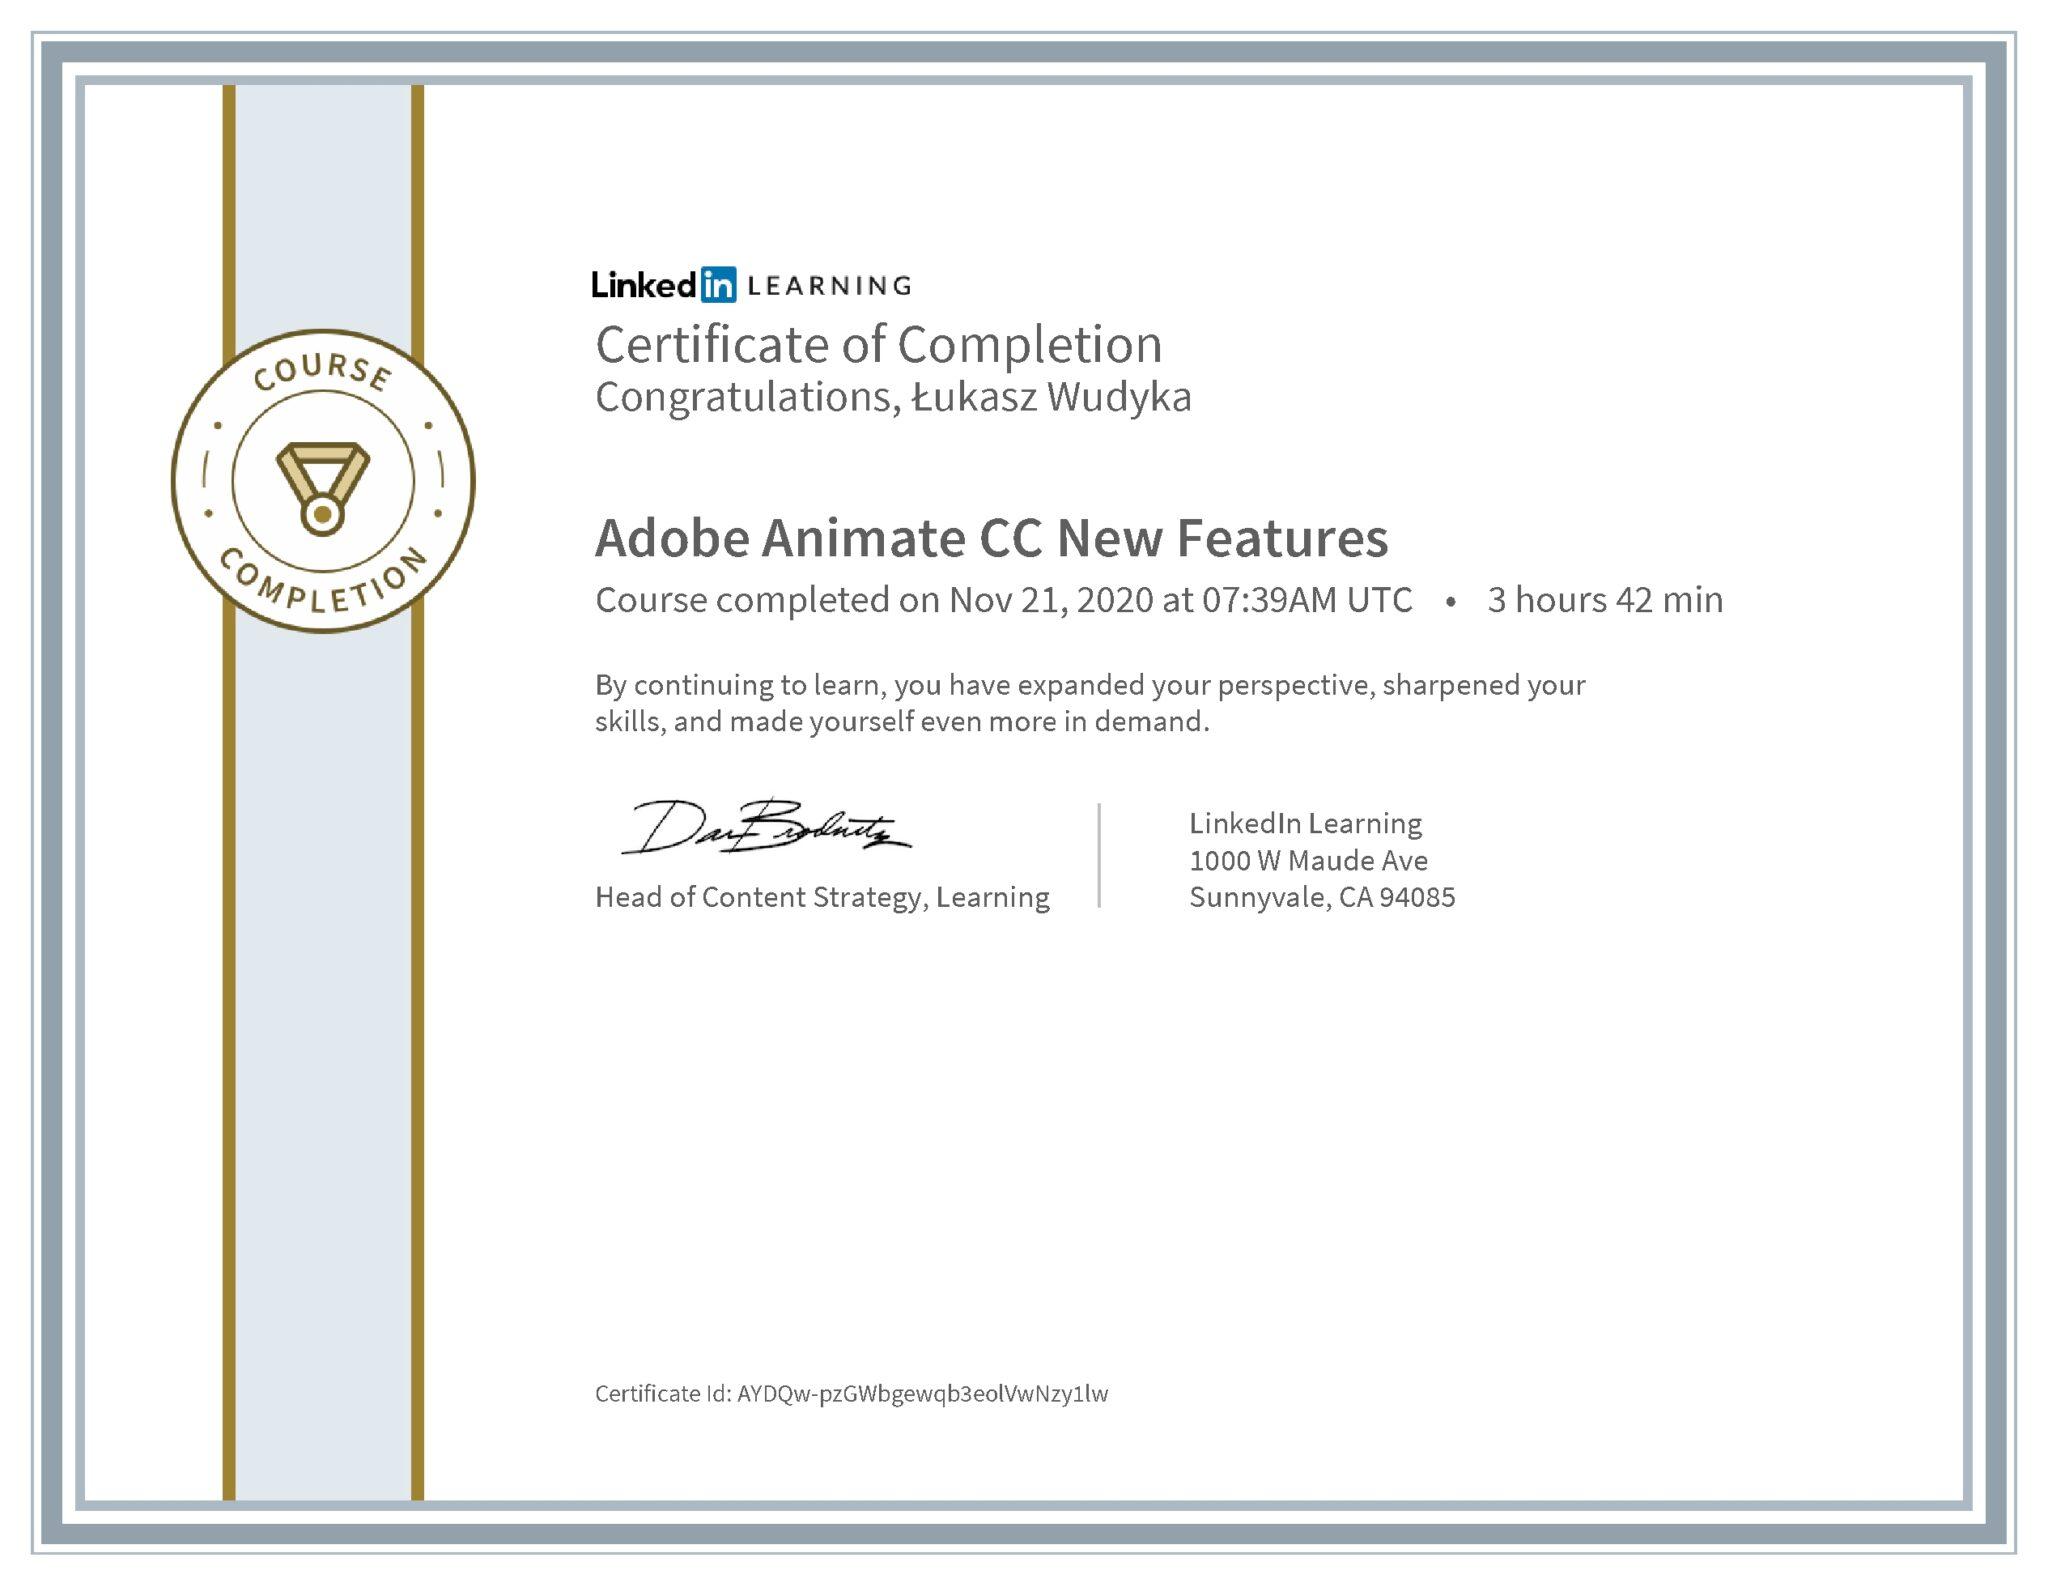 Łukasz Wudyka certyfikat LinkedIn Adobe Animate CC New Features